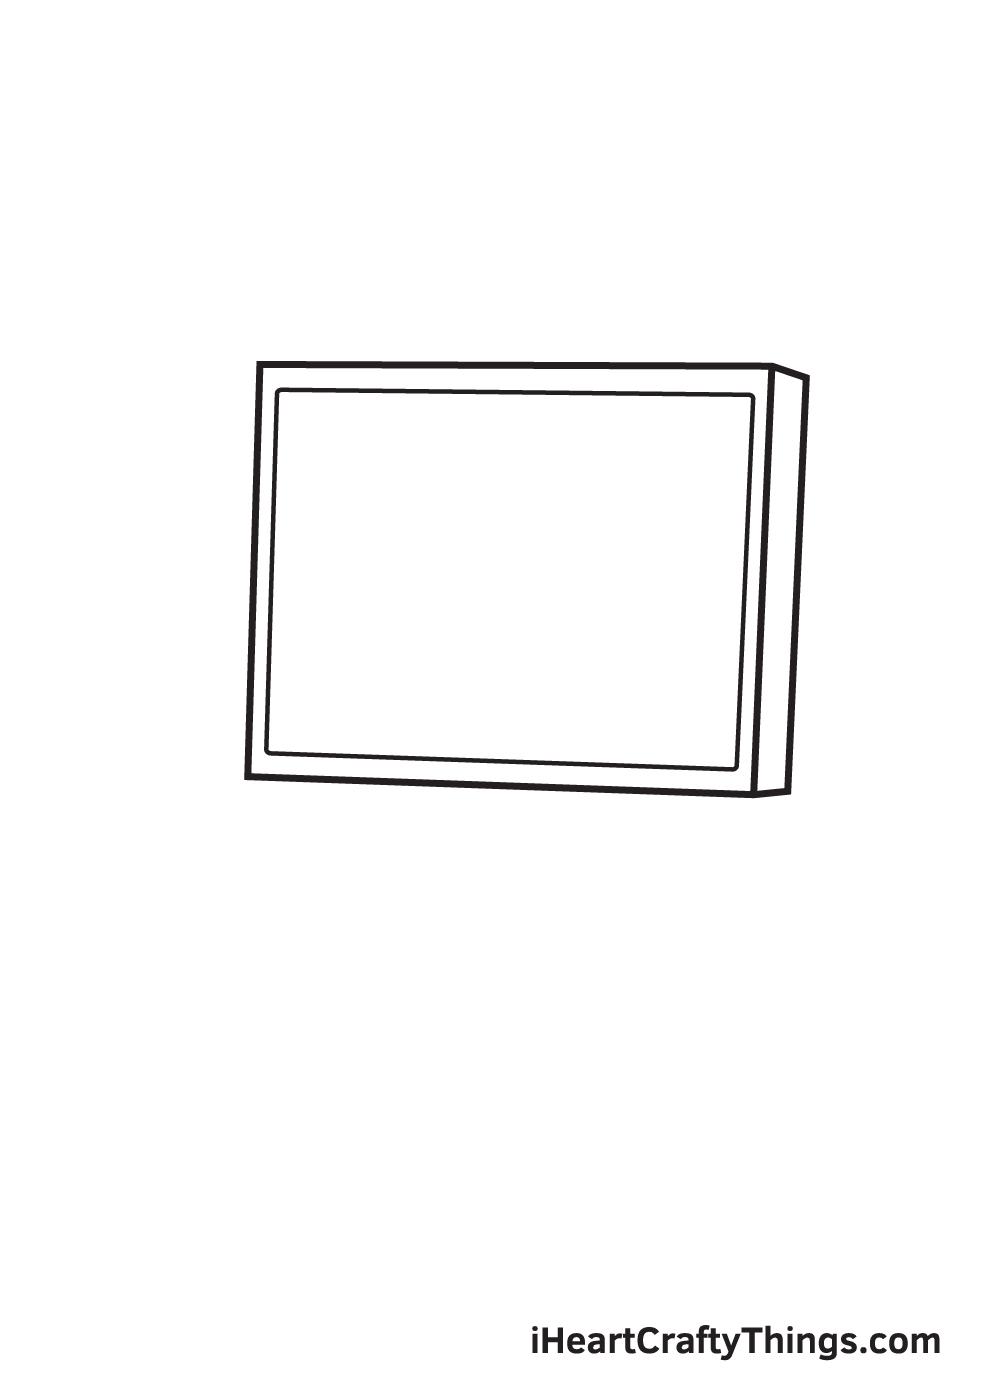 computer drawing - step 2